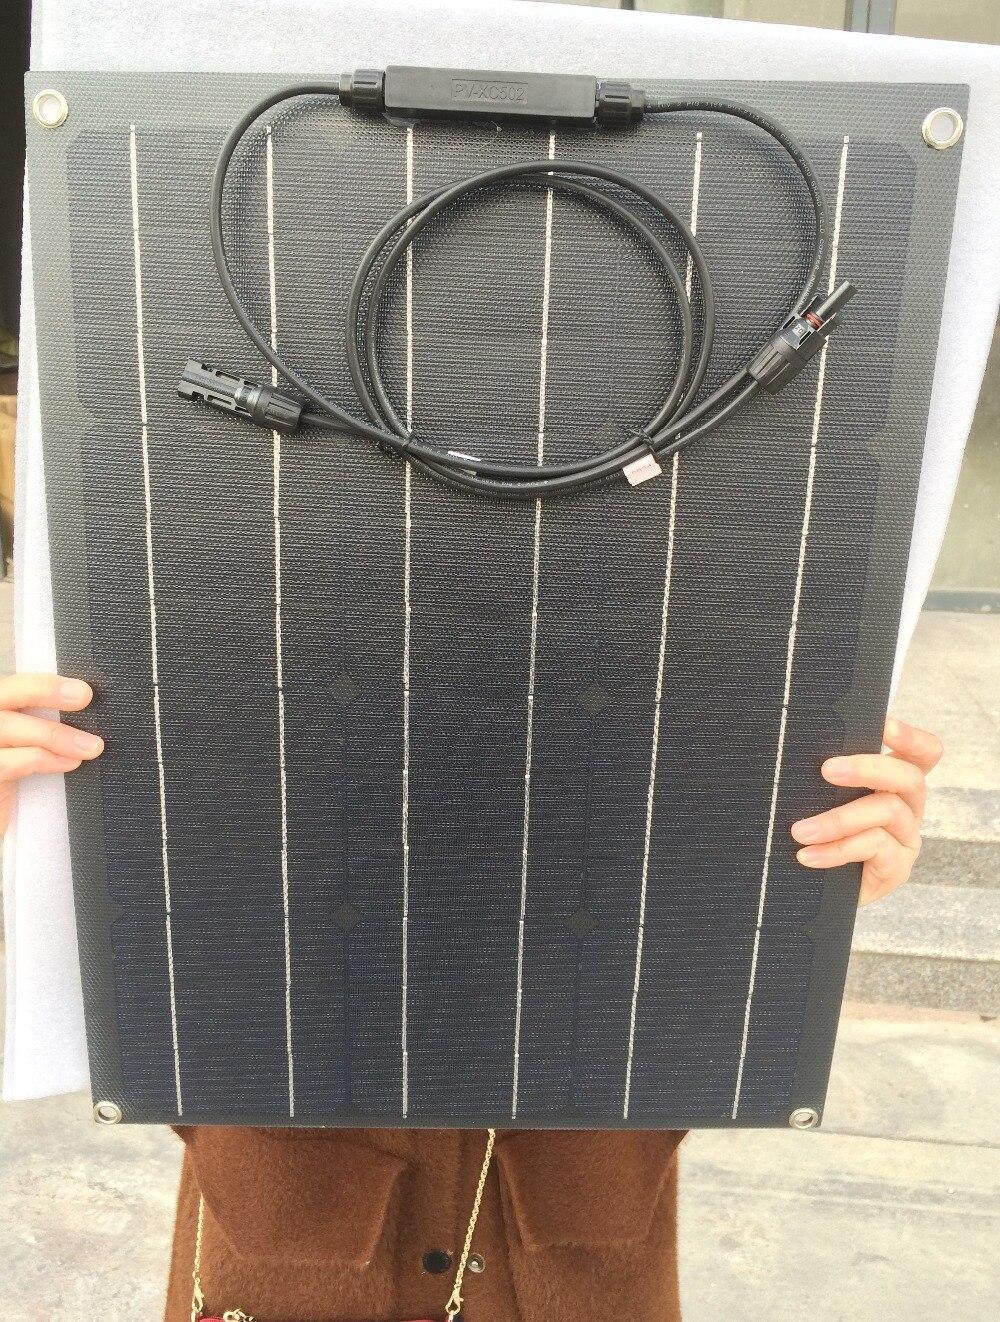 1pcs Solar Panel 40W ETFE Semi Flexible Solar Panel 40W 12V Mono for Caravan Home Off Gird 12V Battery Charging Power|Solar Cells| |  - title=